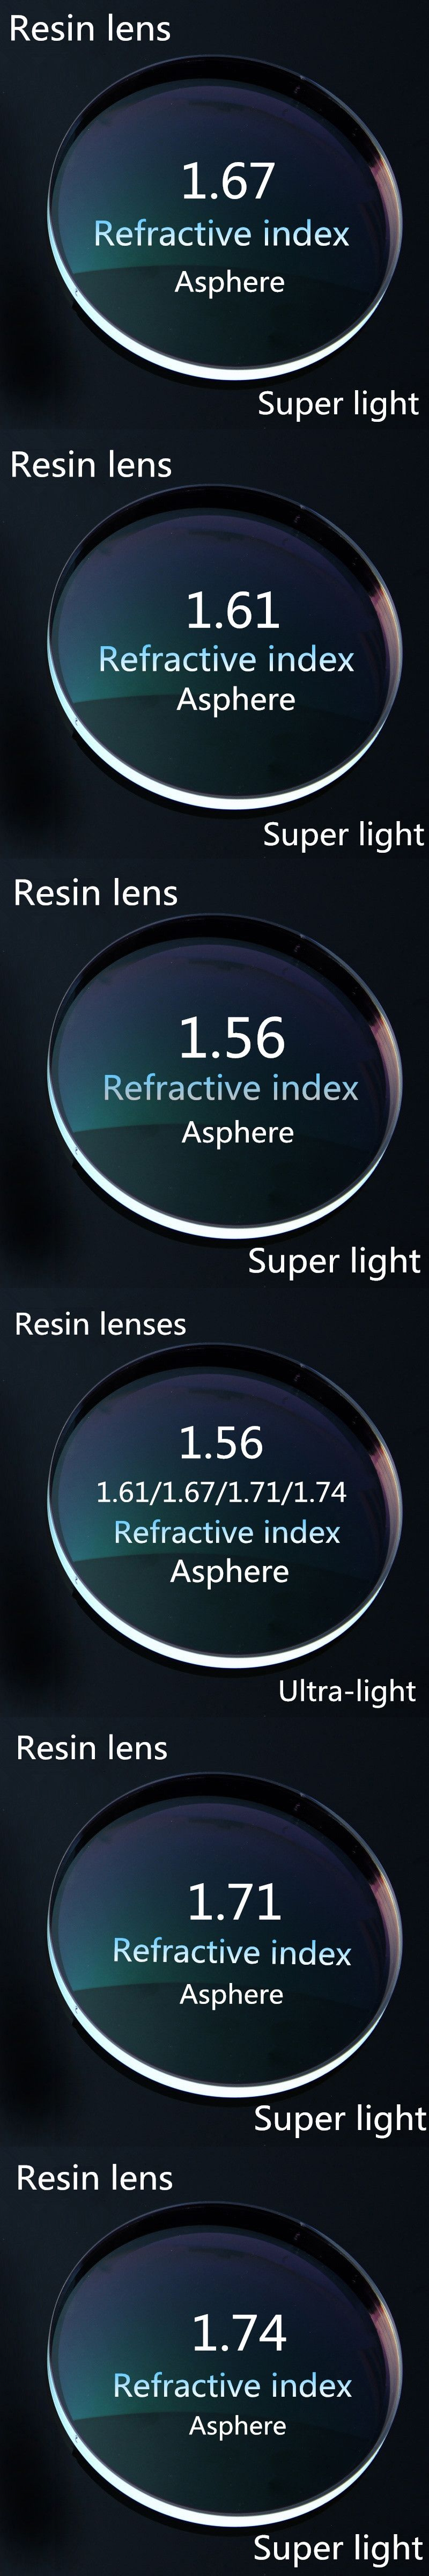 aabf954dca2 Resin Prescription Optical Asphere Lenses 1.56 1.61 1.67 1.71  1.74  Refractive Index Anti Fatigue Myopia reading glasses lense